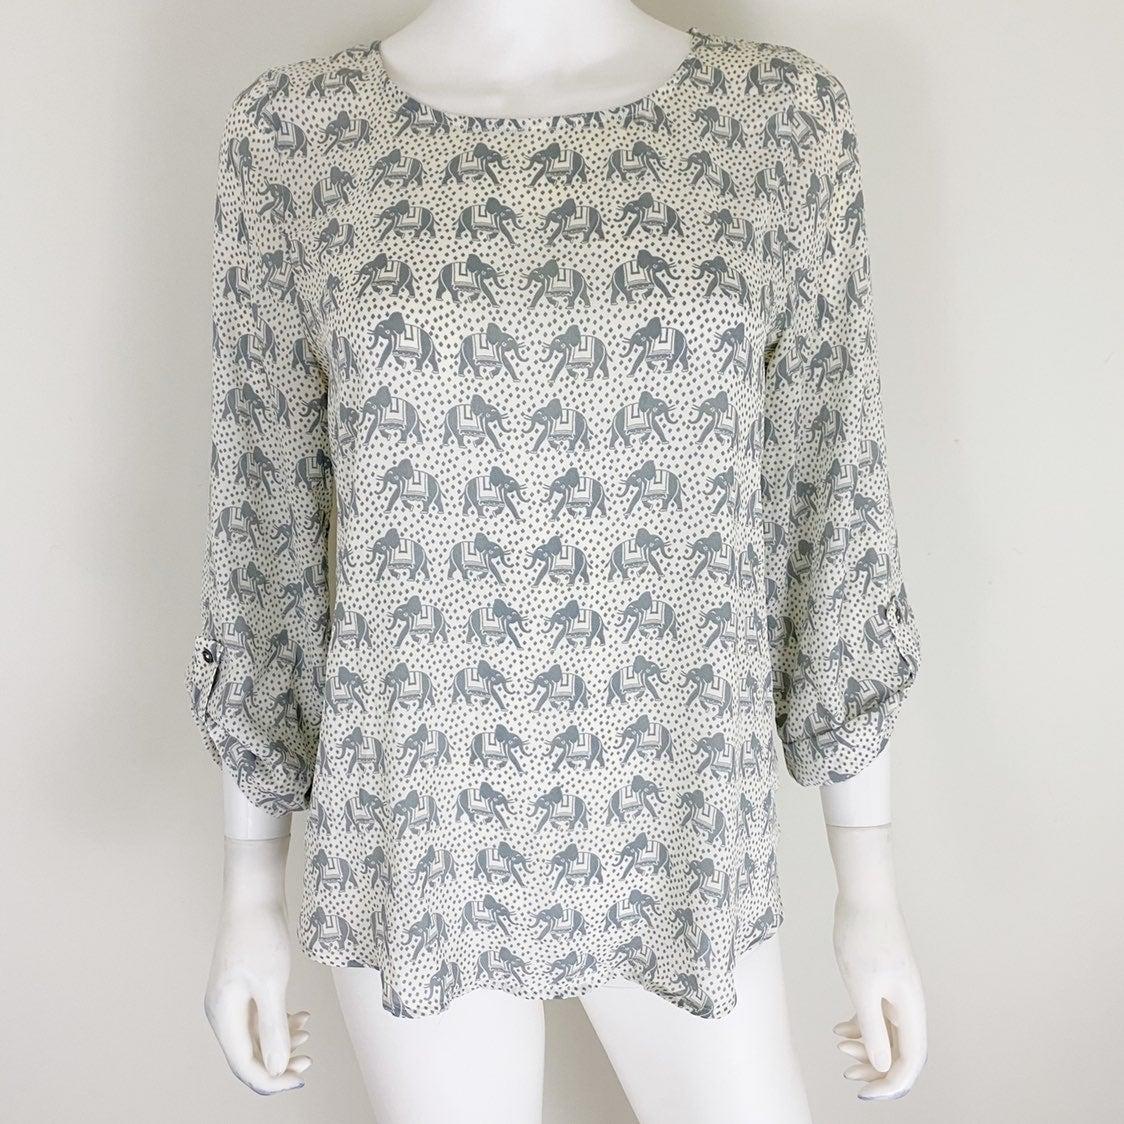 41 Hawthorn S Tunic Ellie Elephant Print